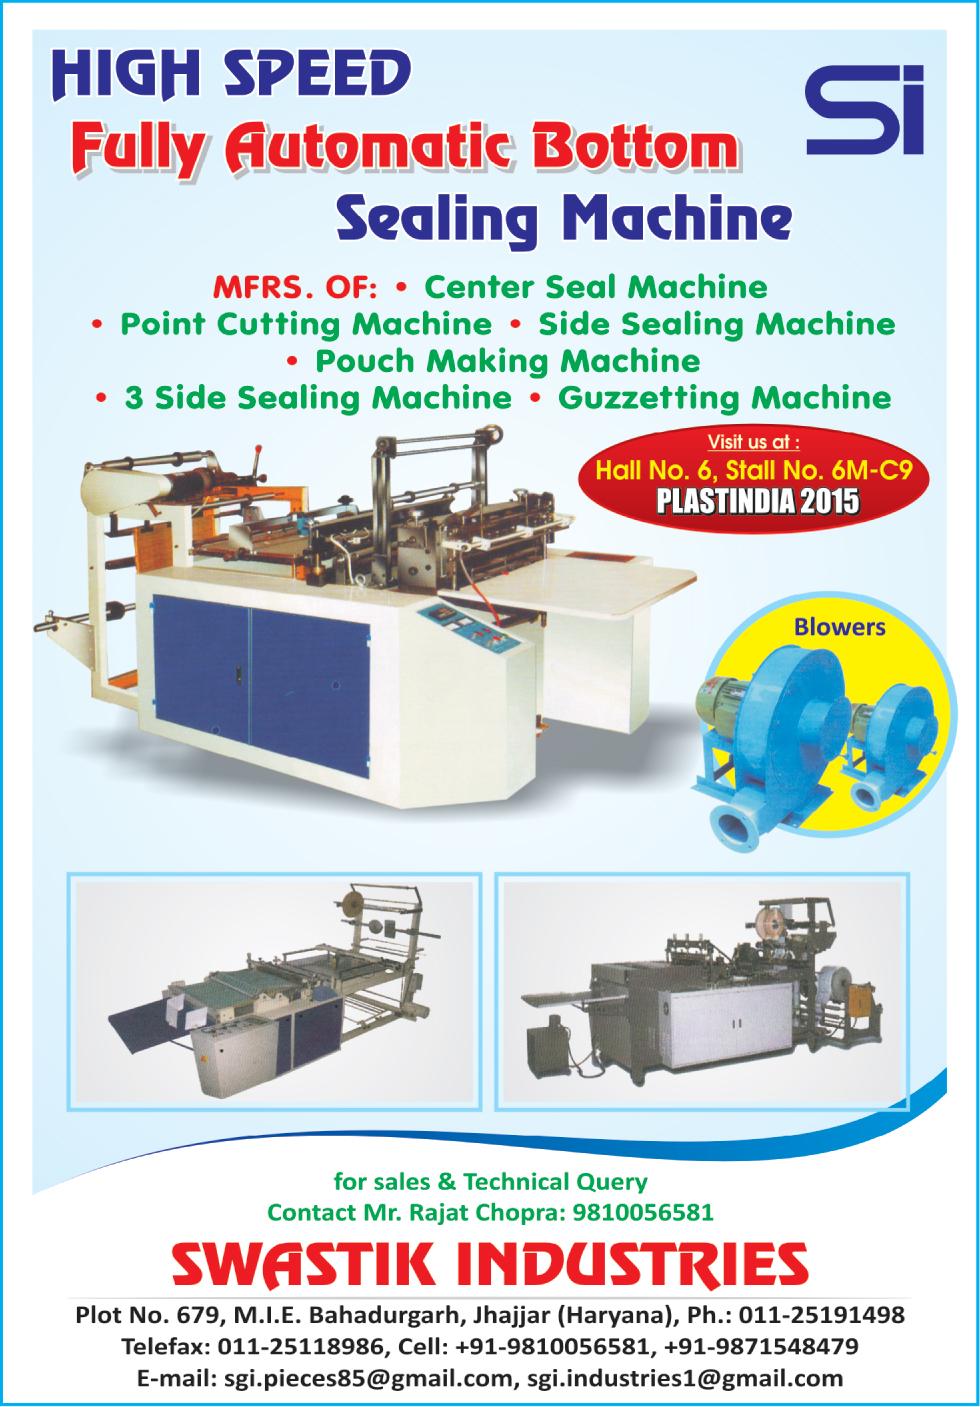 Center Seal Machines, Paint Cutting Machines, Side Sealing Machines, Pouch Making Machines, Three Side Sealing Machines, Guzzetting Machines, Bottom Sealing Machines